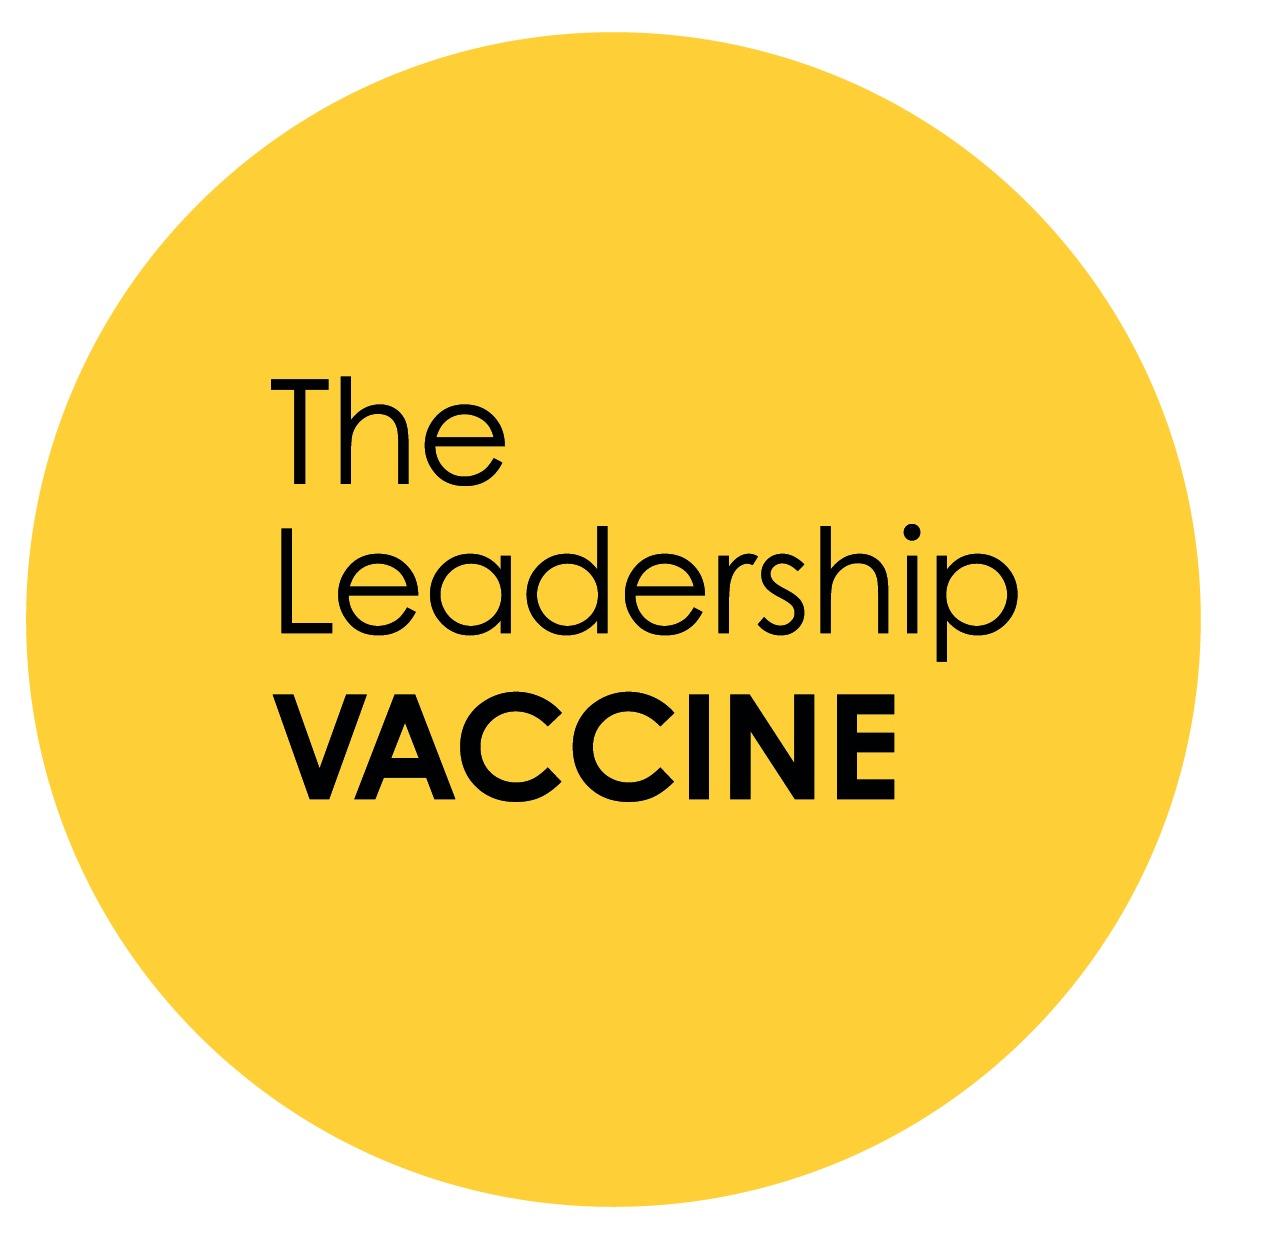 The Leadership Vaccine